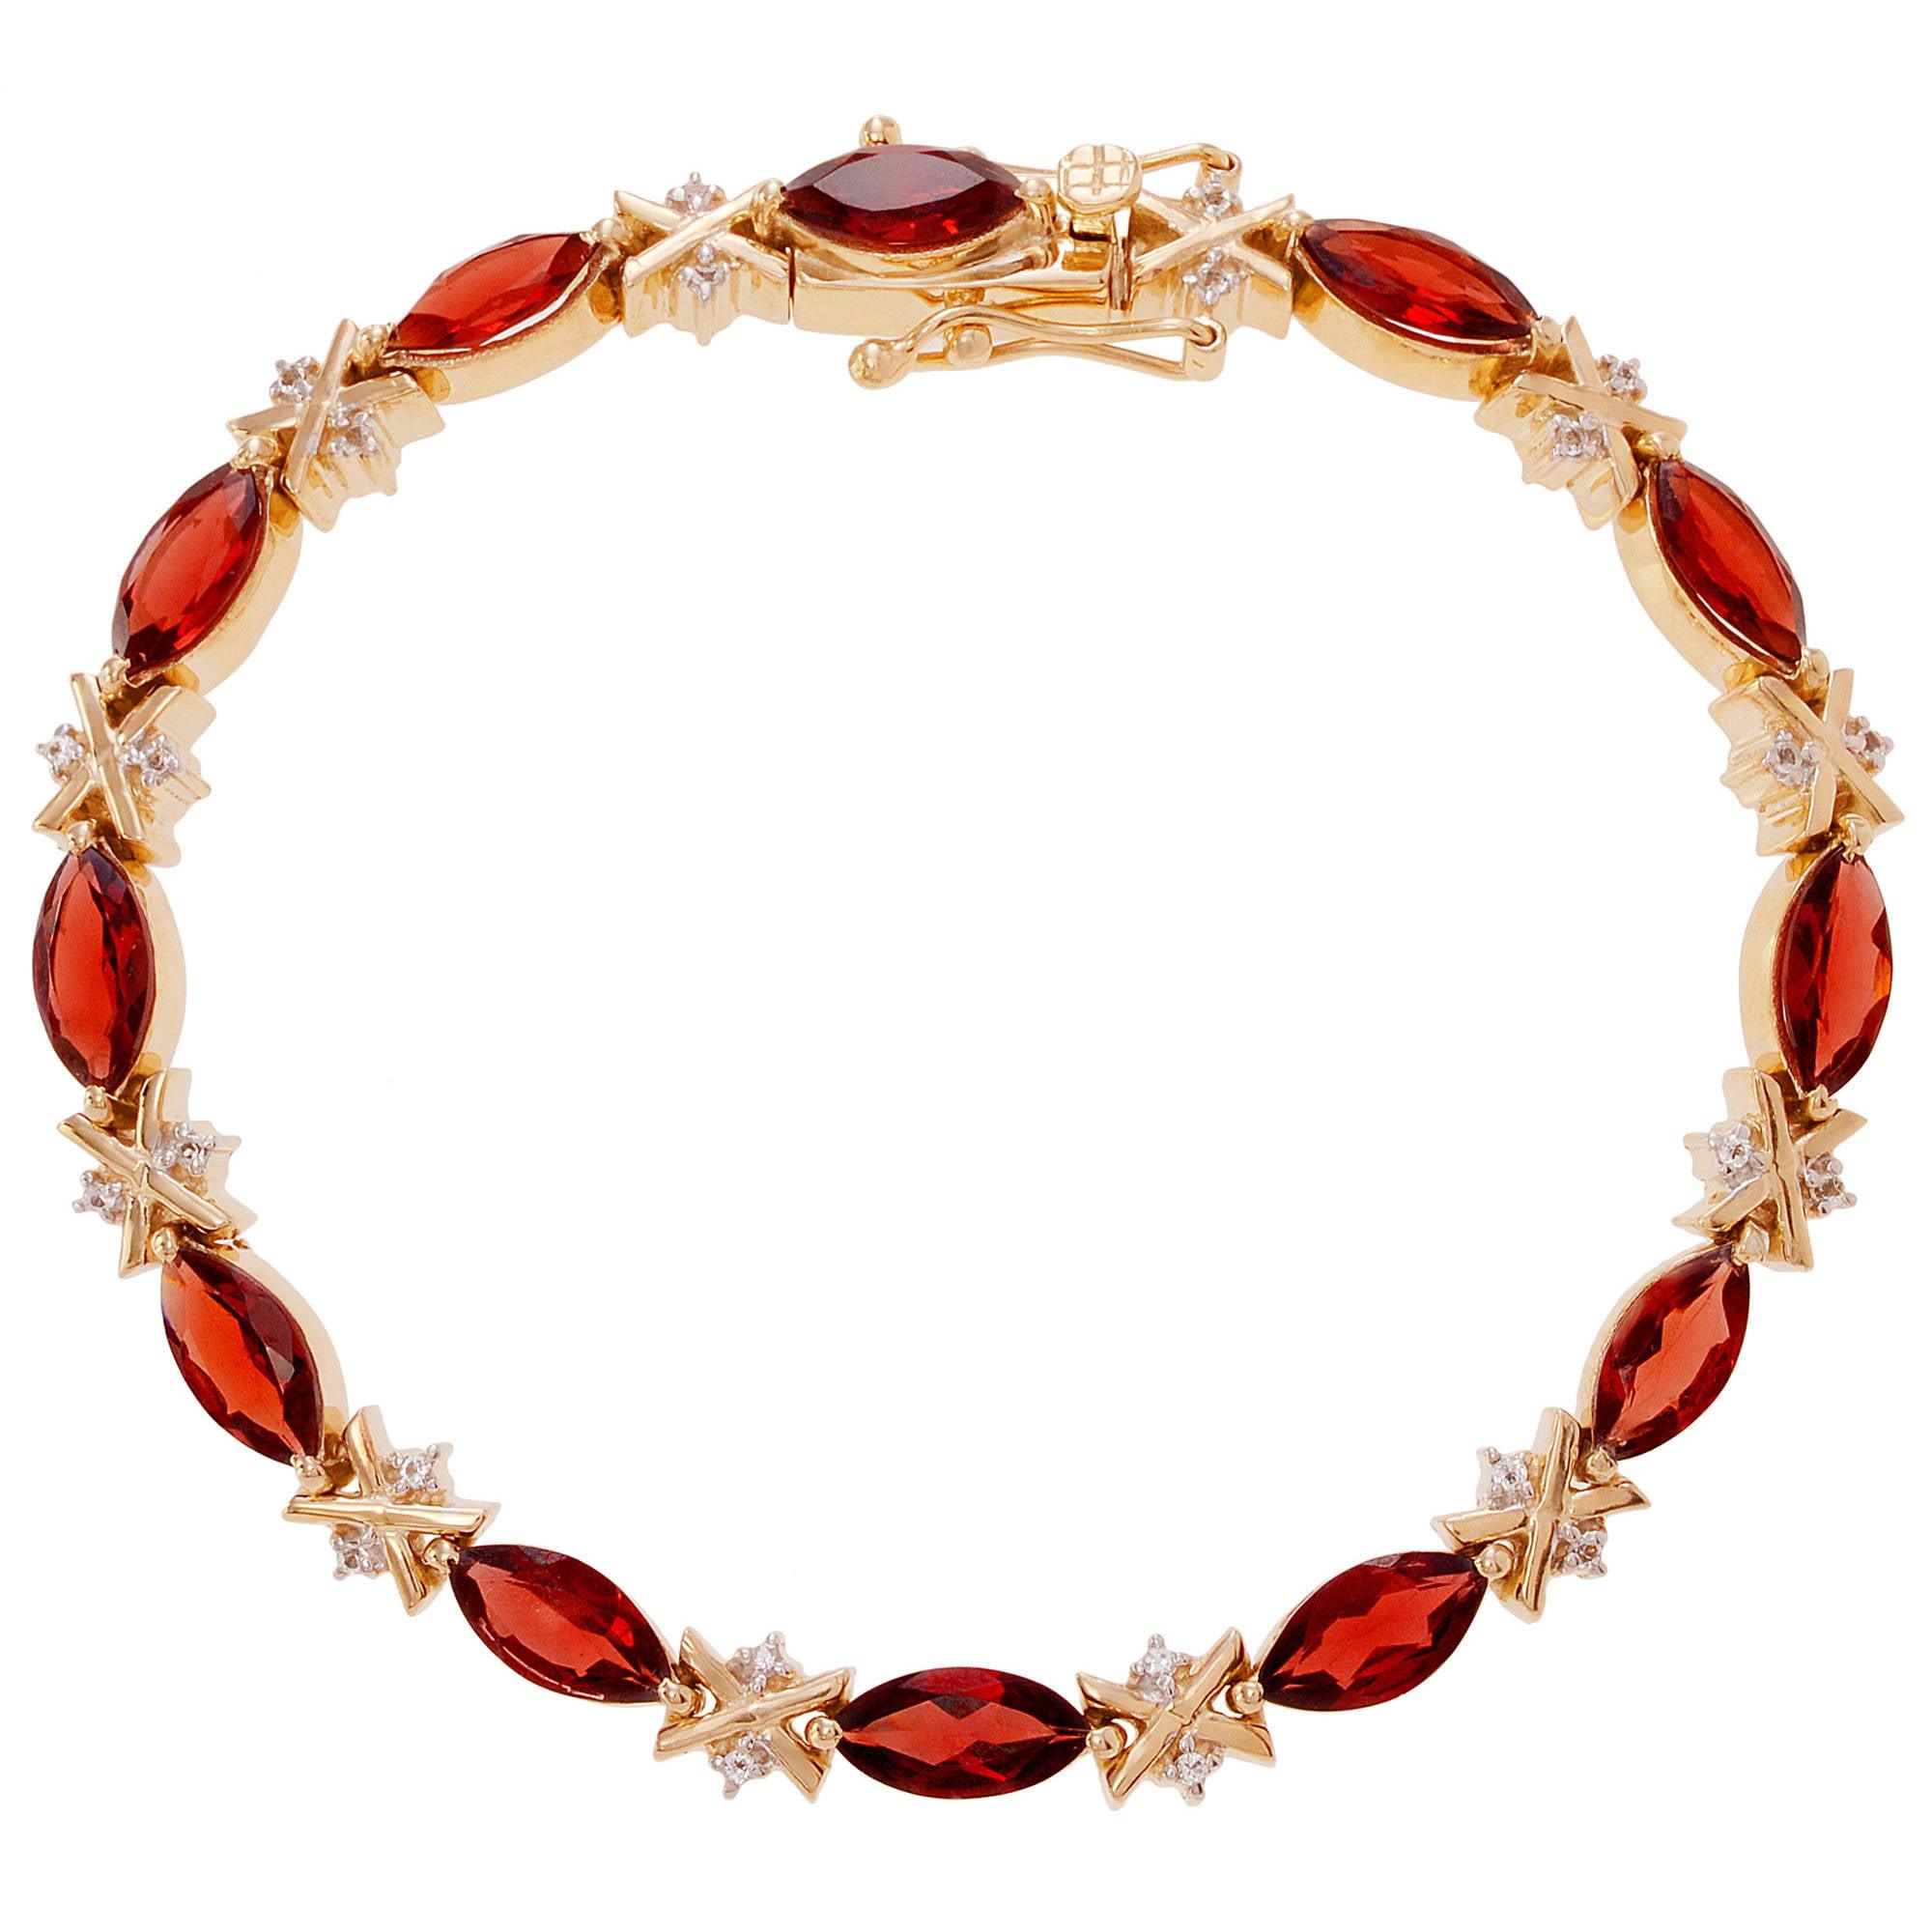 "Brinley Co. Women's Garnet 14K Gold-Plated Sterling Silver Topaz Accent Tennis Bracelet, 8"" by KNS International"